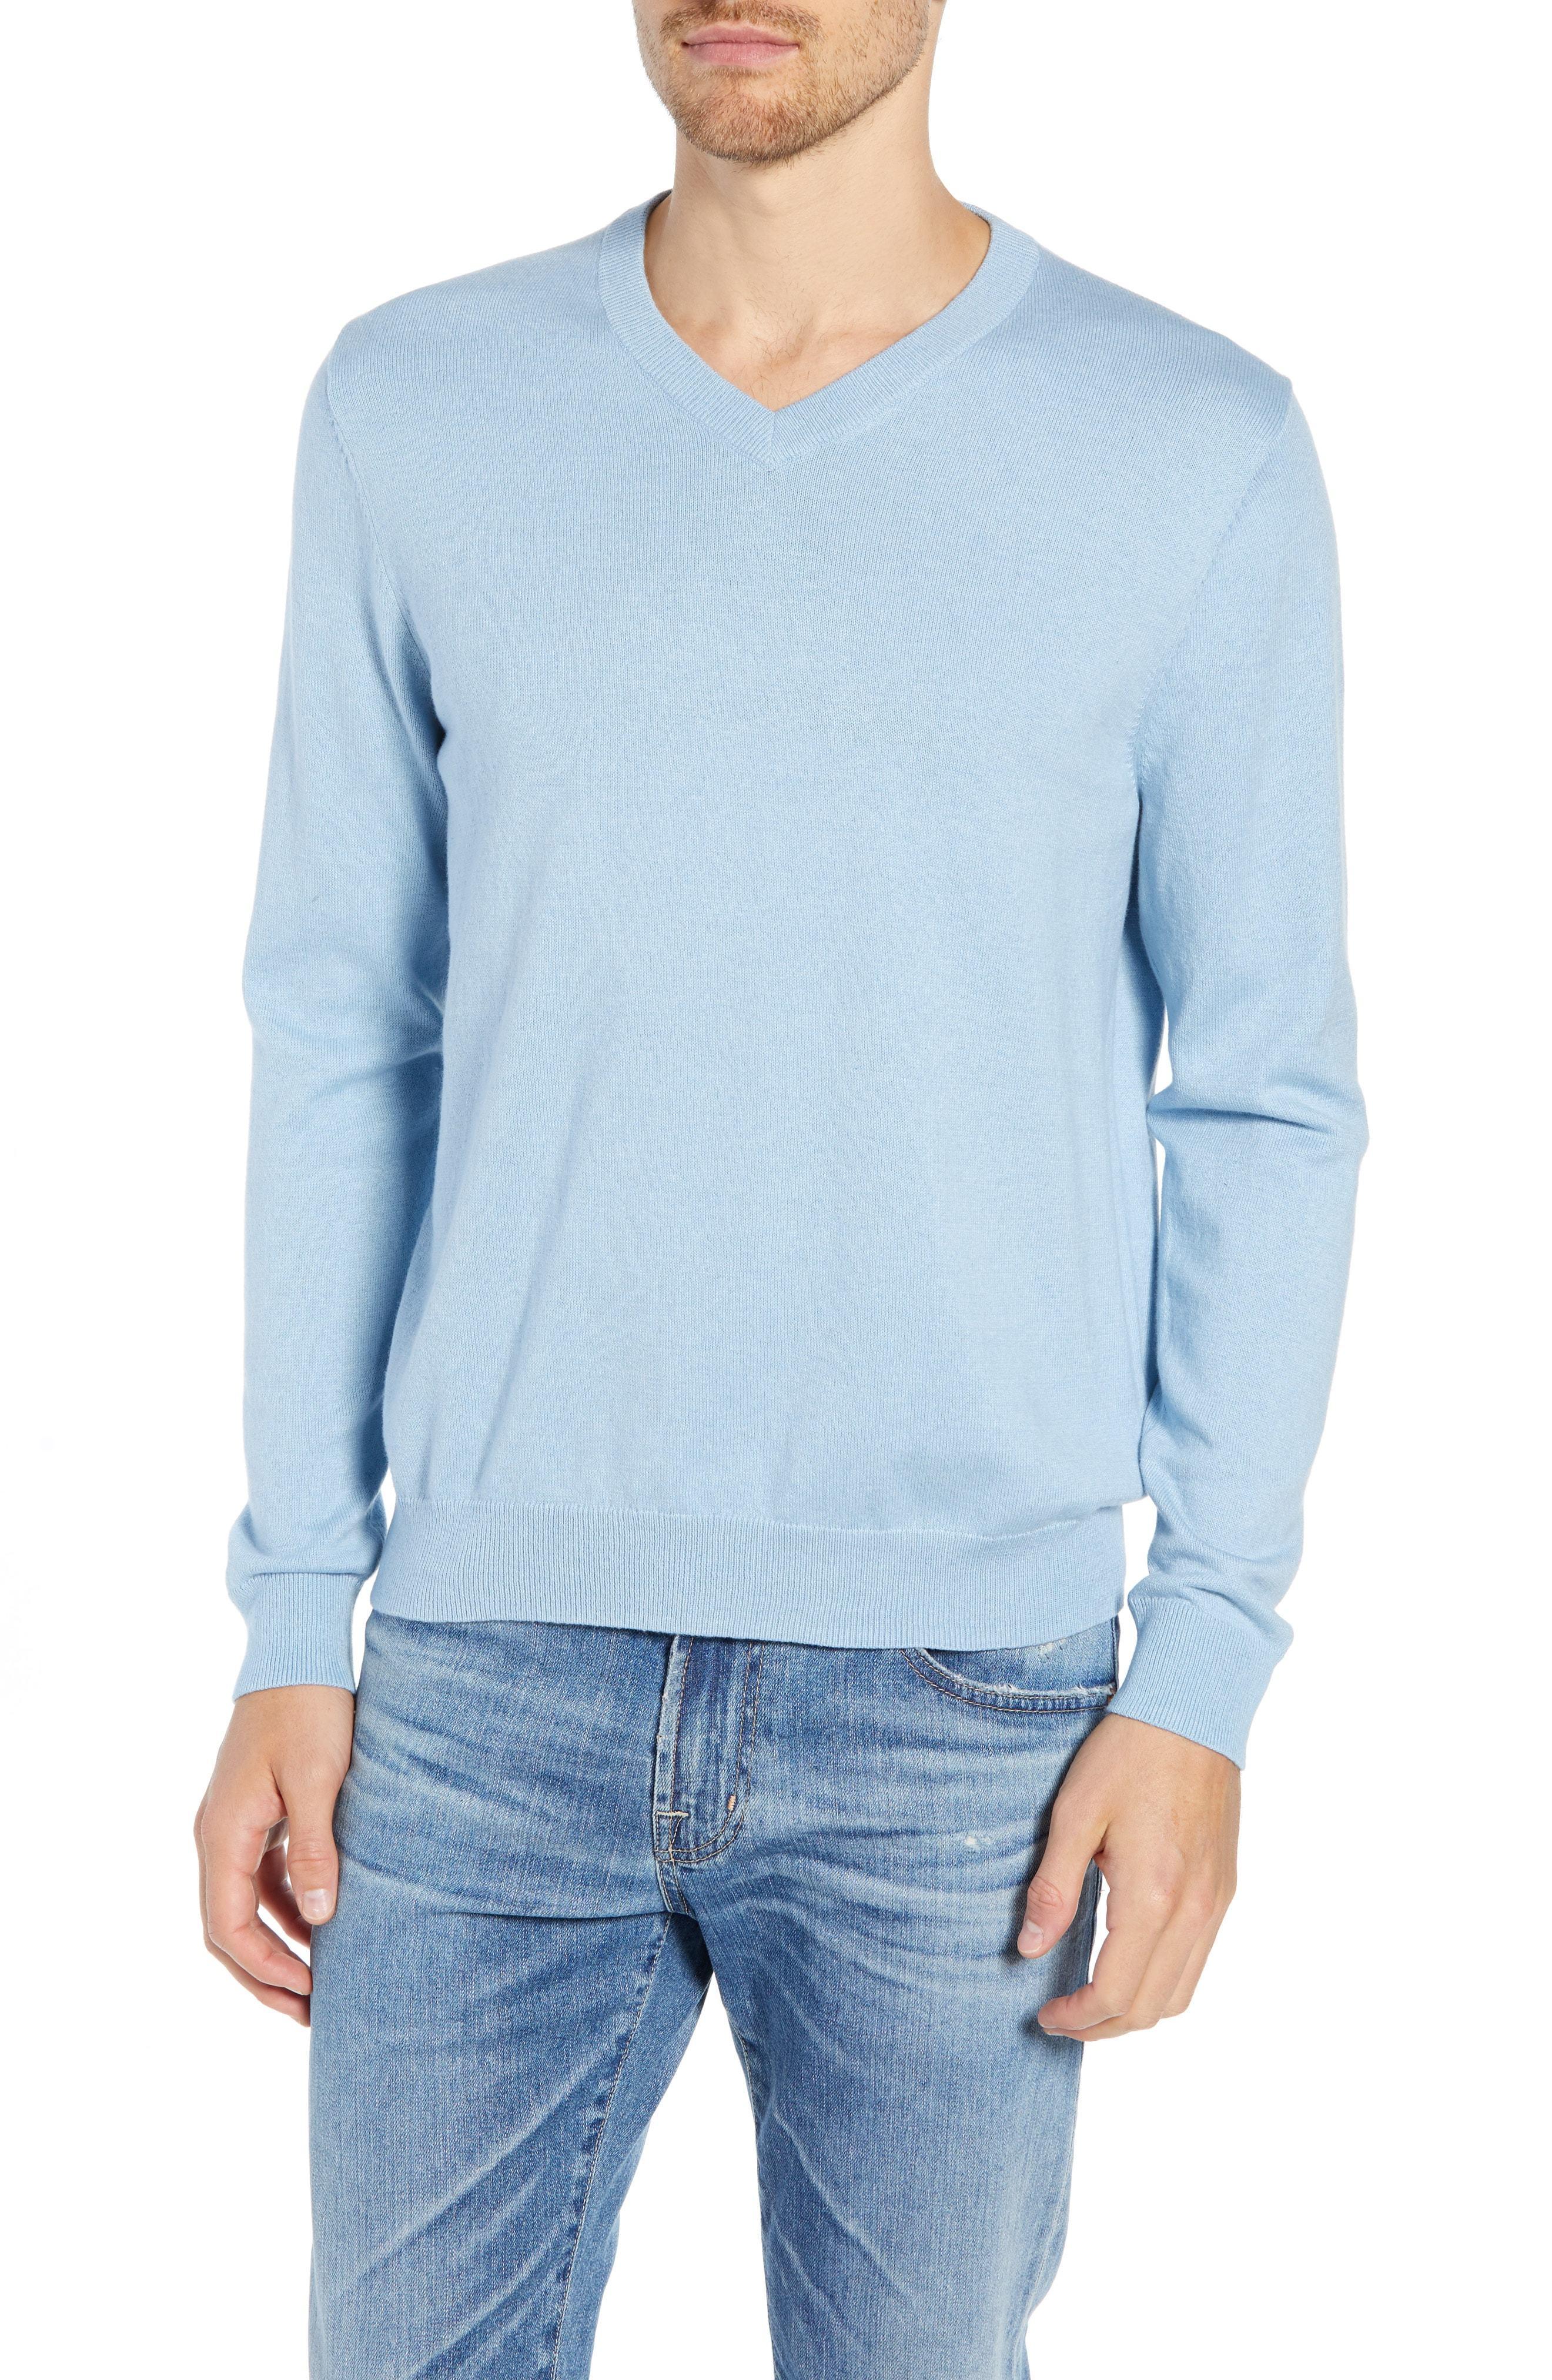 d3608389903f Nordstrom Men s Shop Cotton Cashmere V Neck Sweater